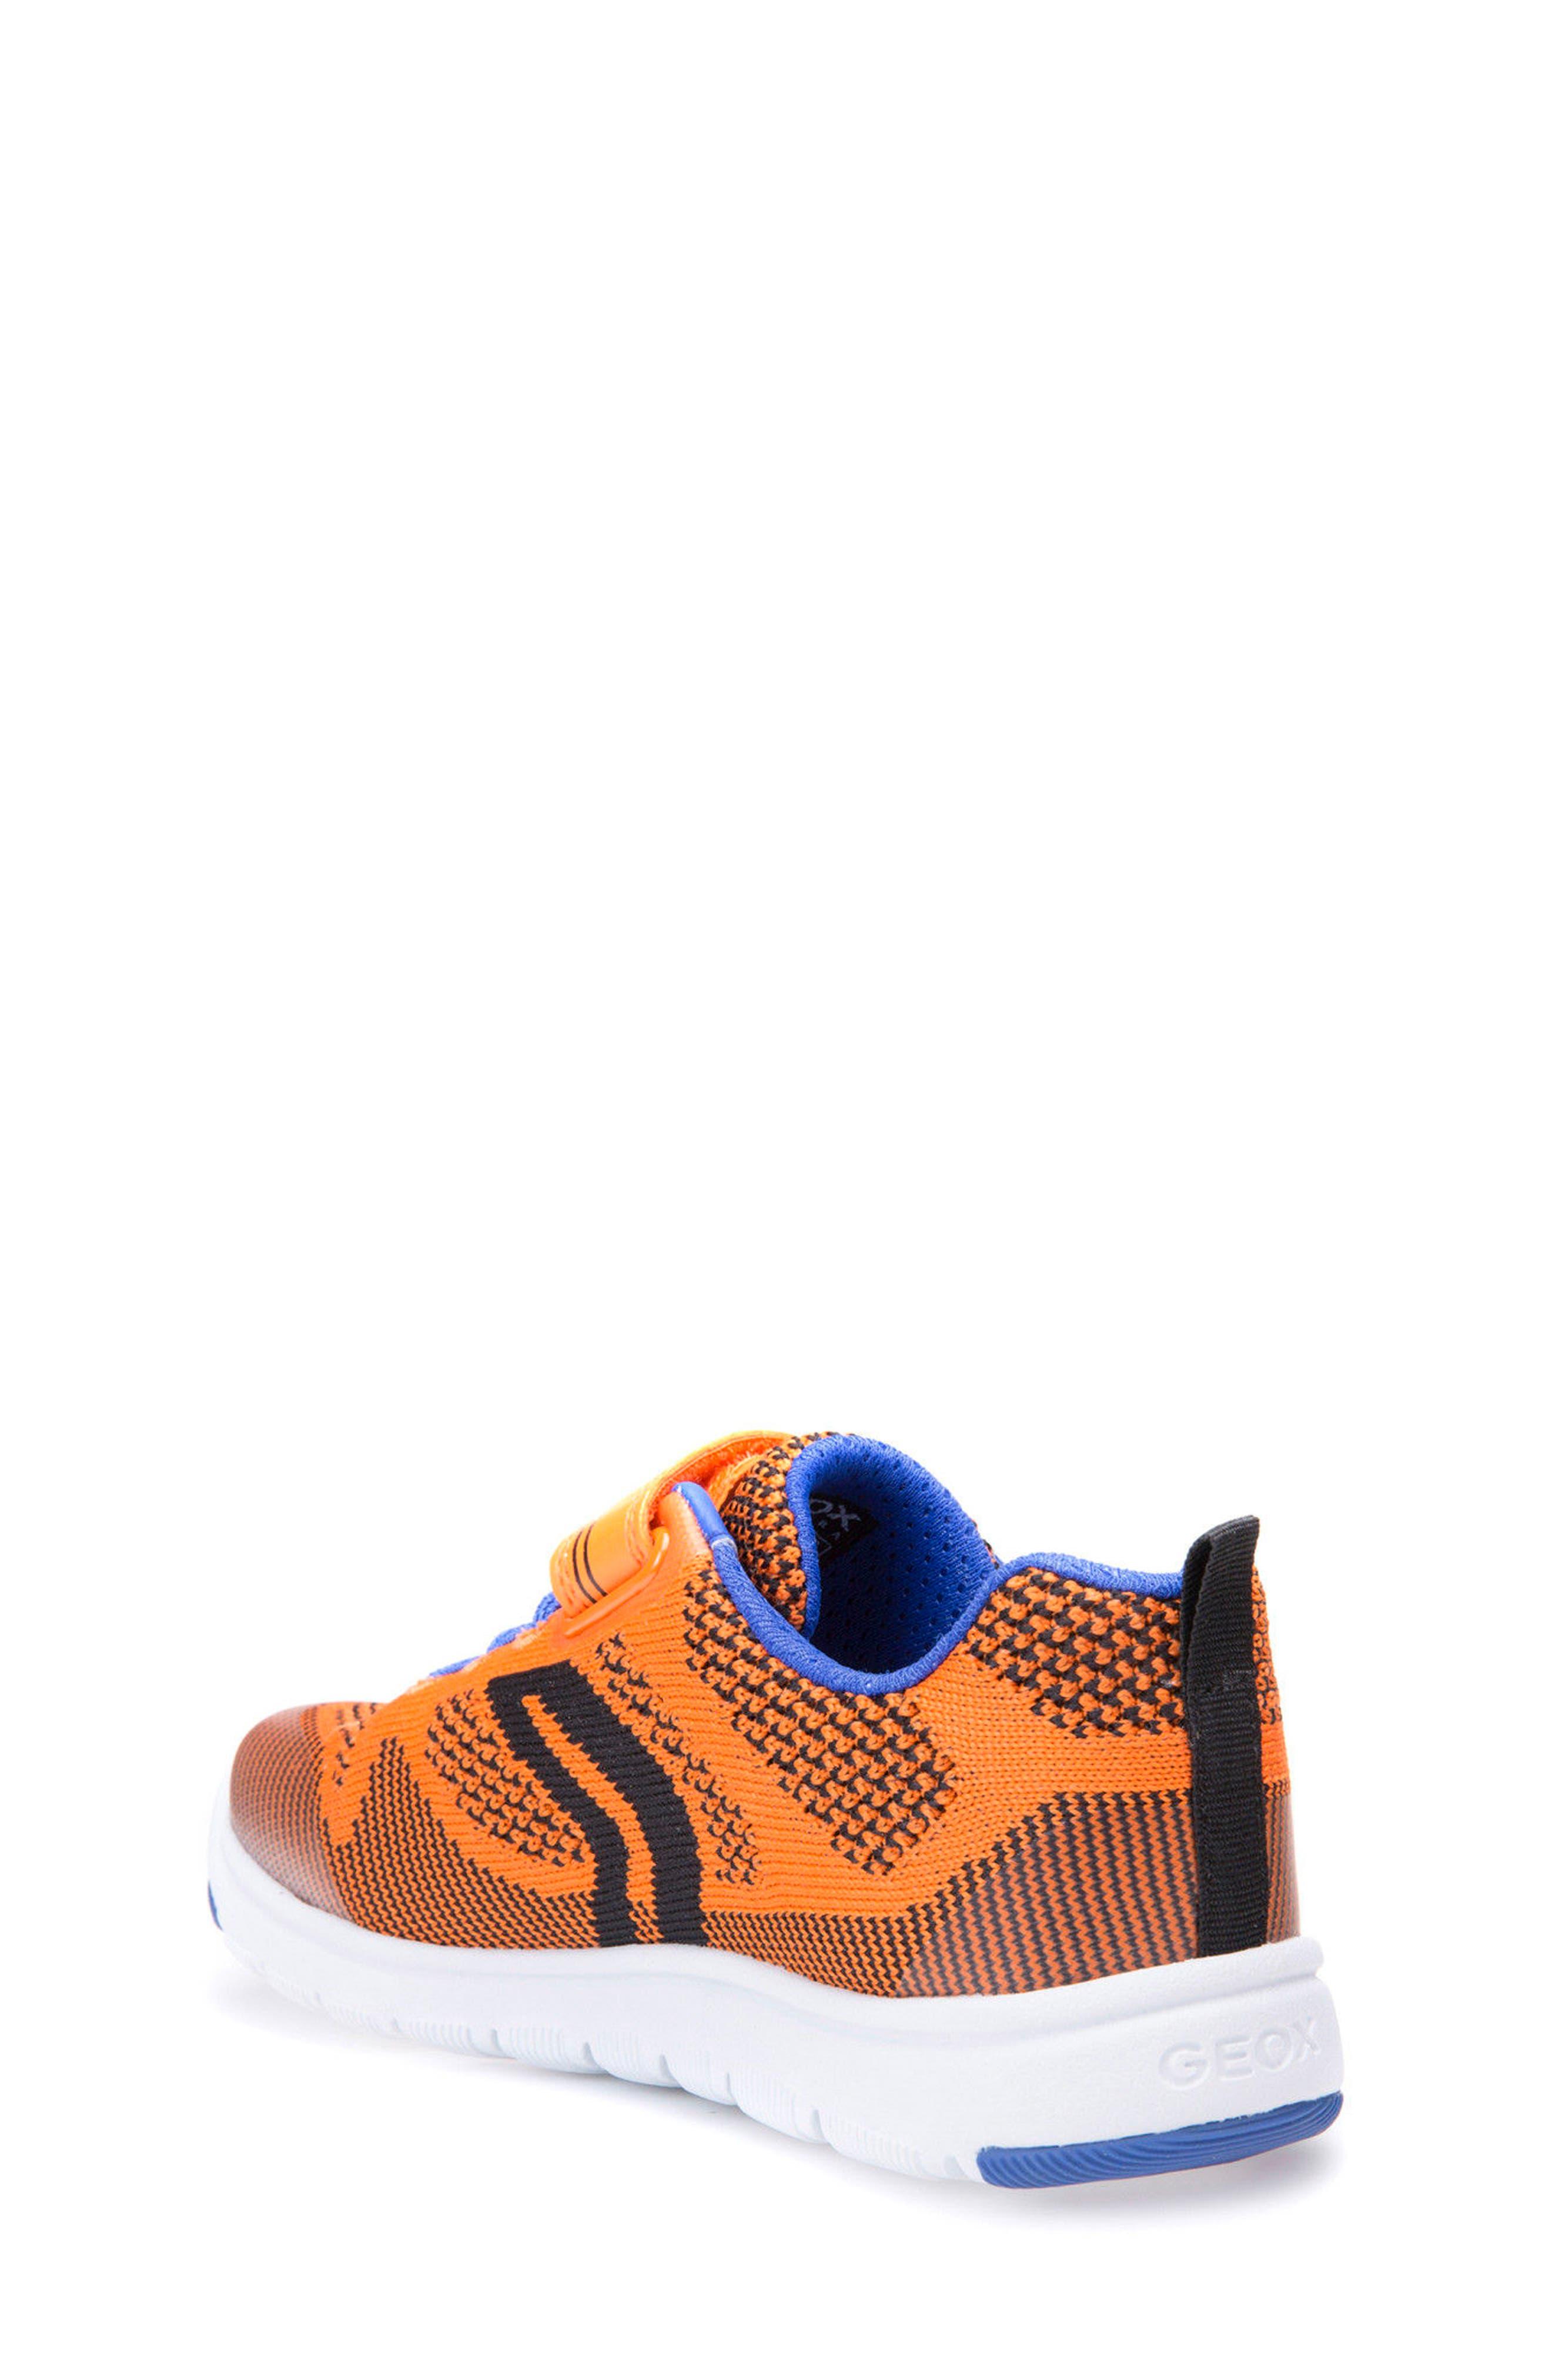 Xunday Low Top Woven Sneaker,                             Alternate thumbnail 2, color,                             Orange/ Royal